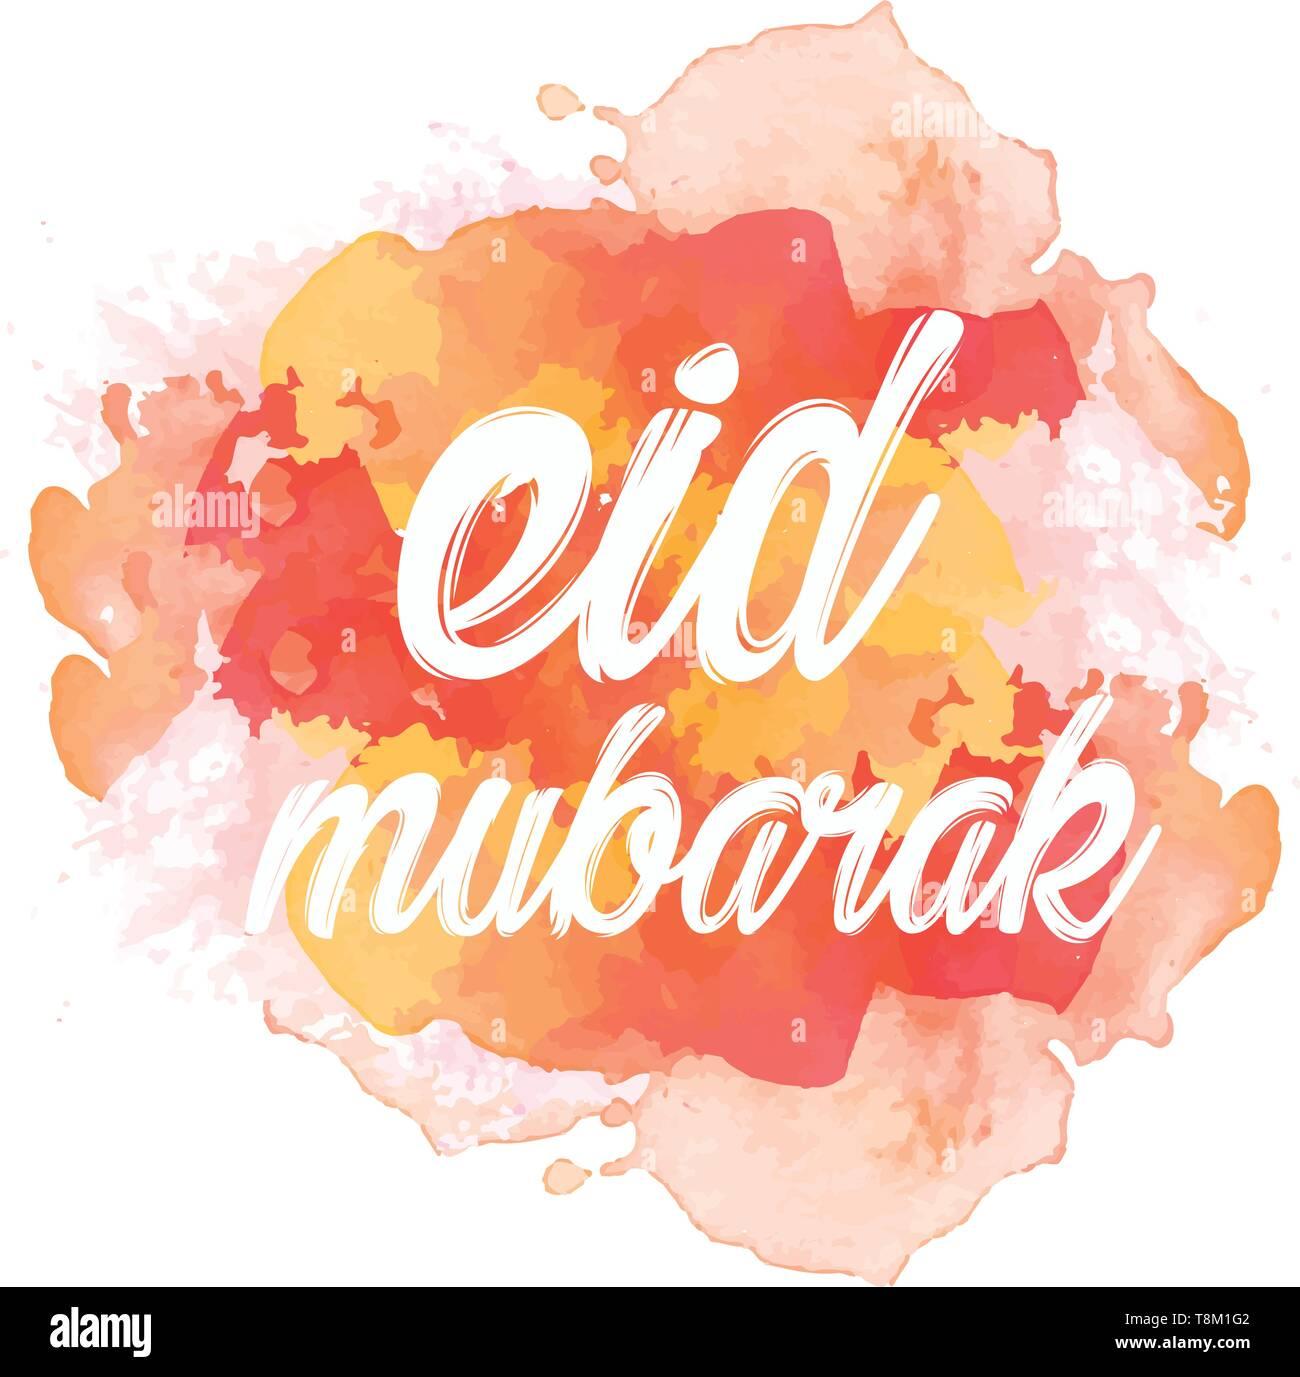 Background to Eid Mubarak  Eid Mubarak's template with illustrations